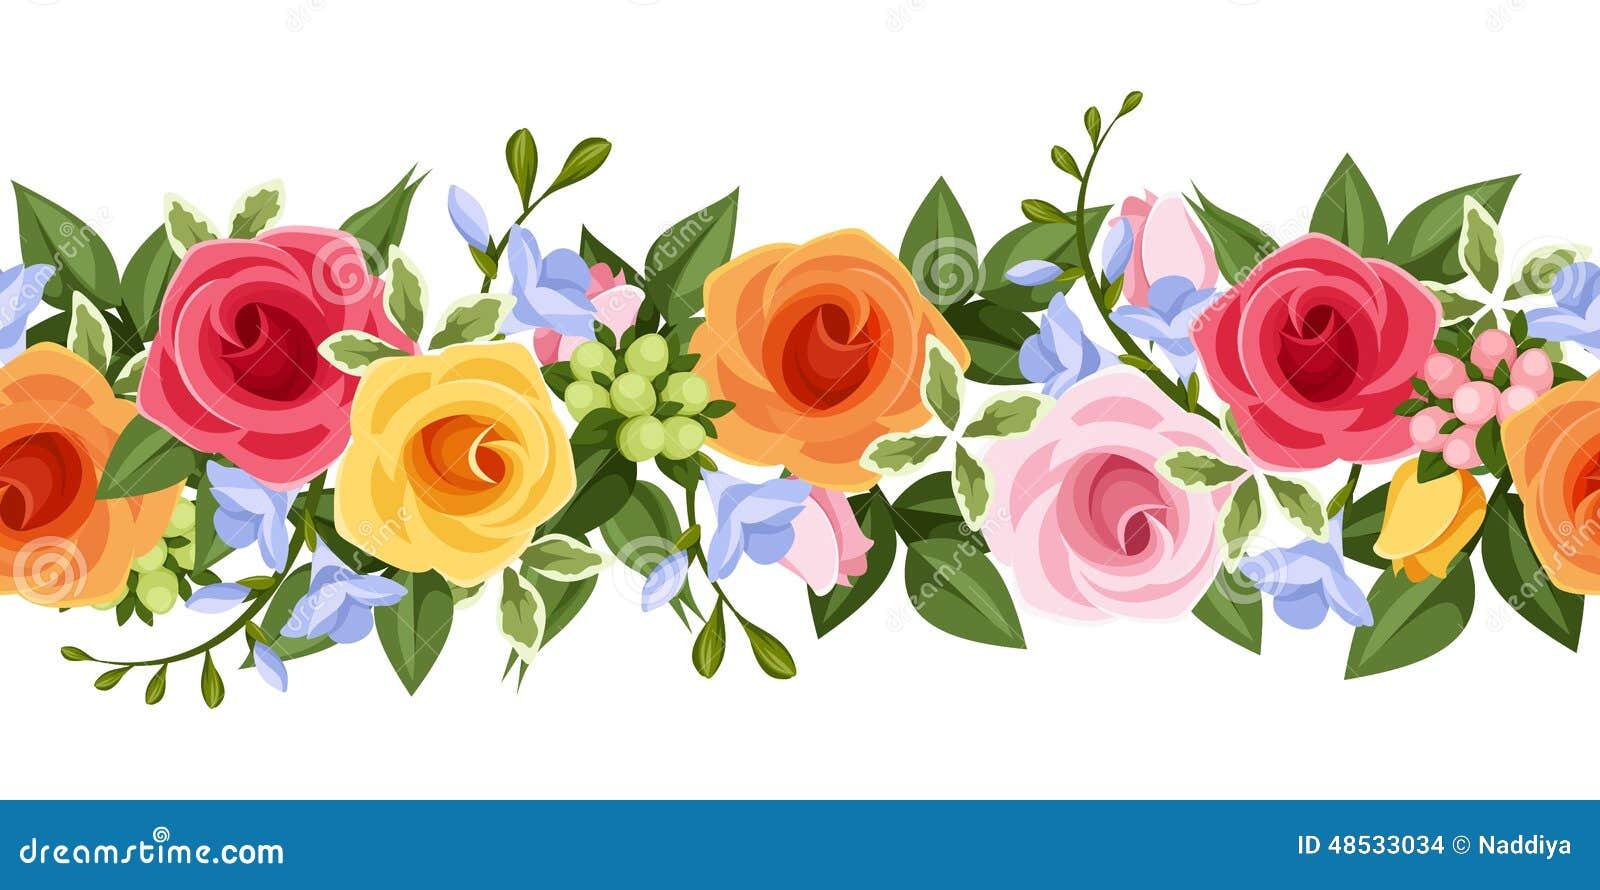 Flores Vectoriales Con Fondo Transparente: Il Fondo Senza Cuciture Orizzontale Con Le Rose Variopinte